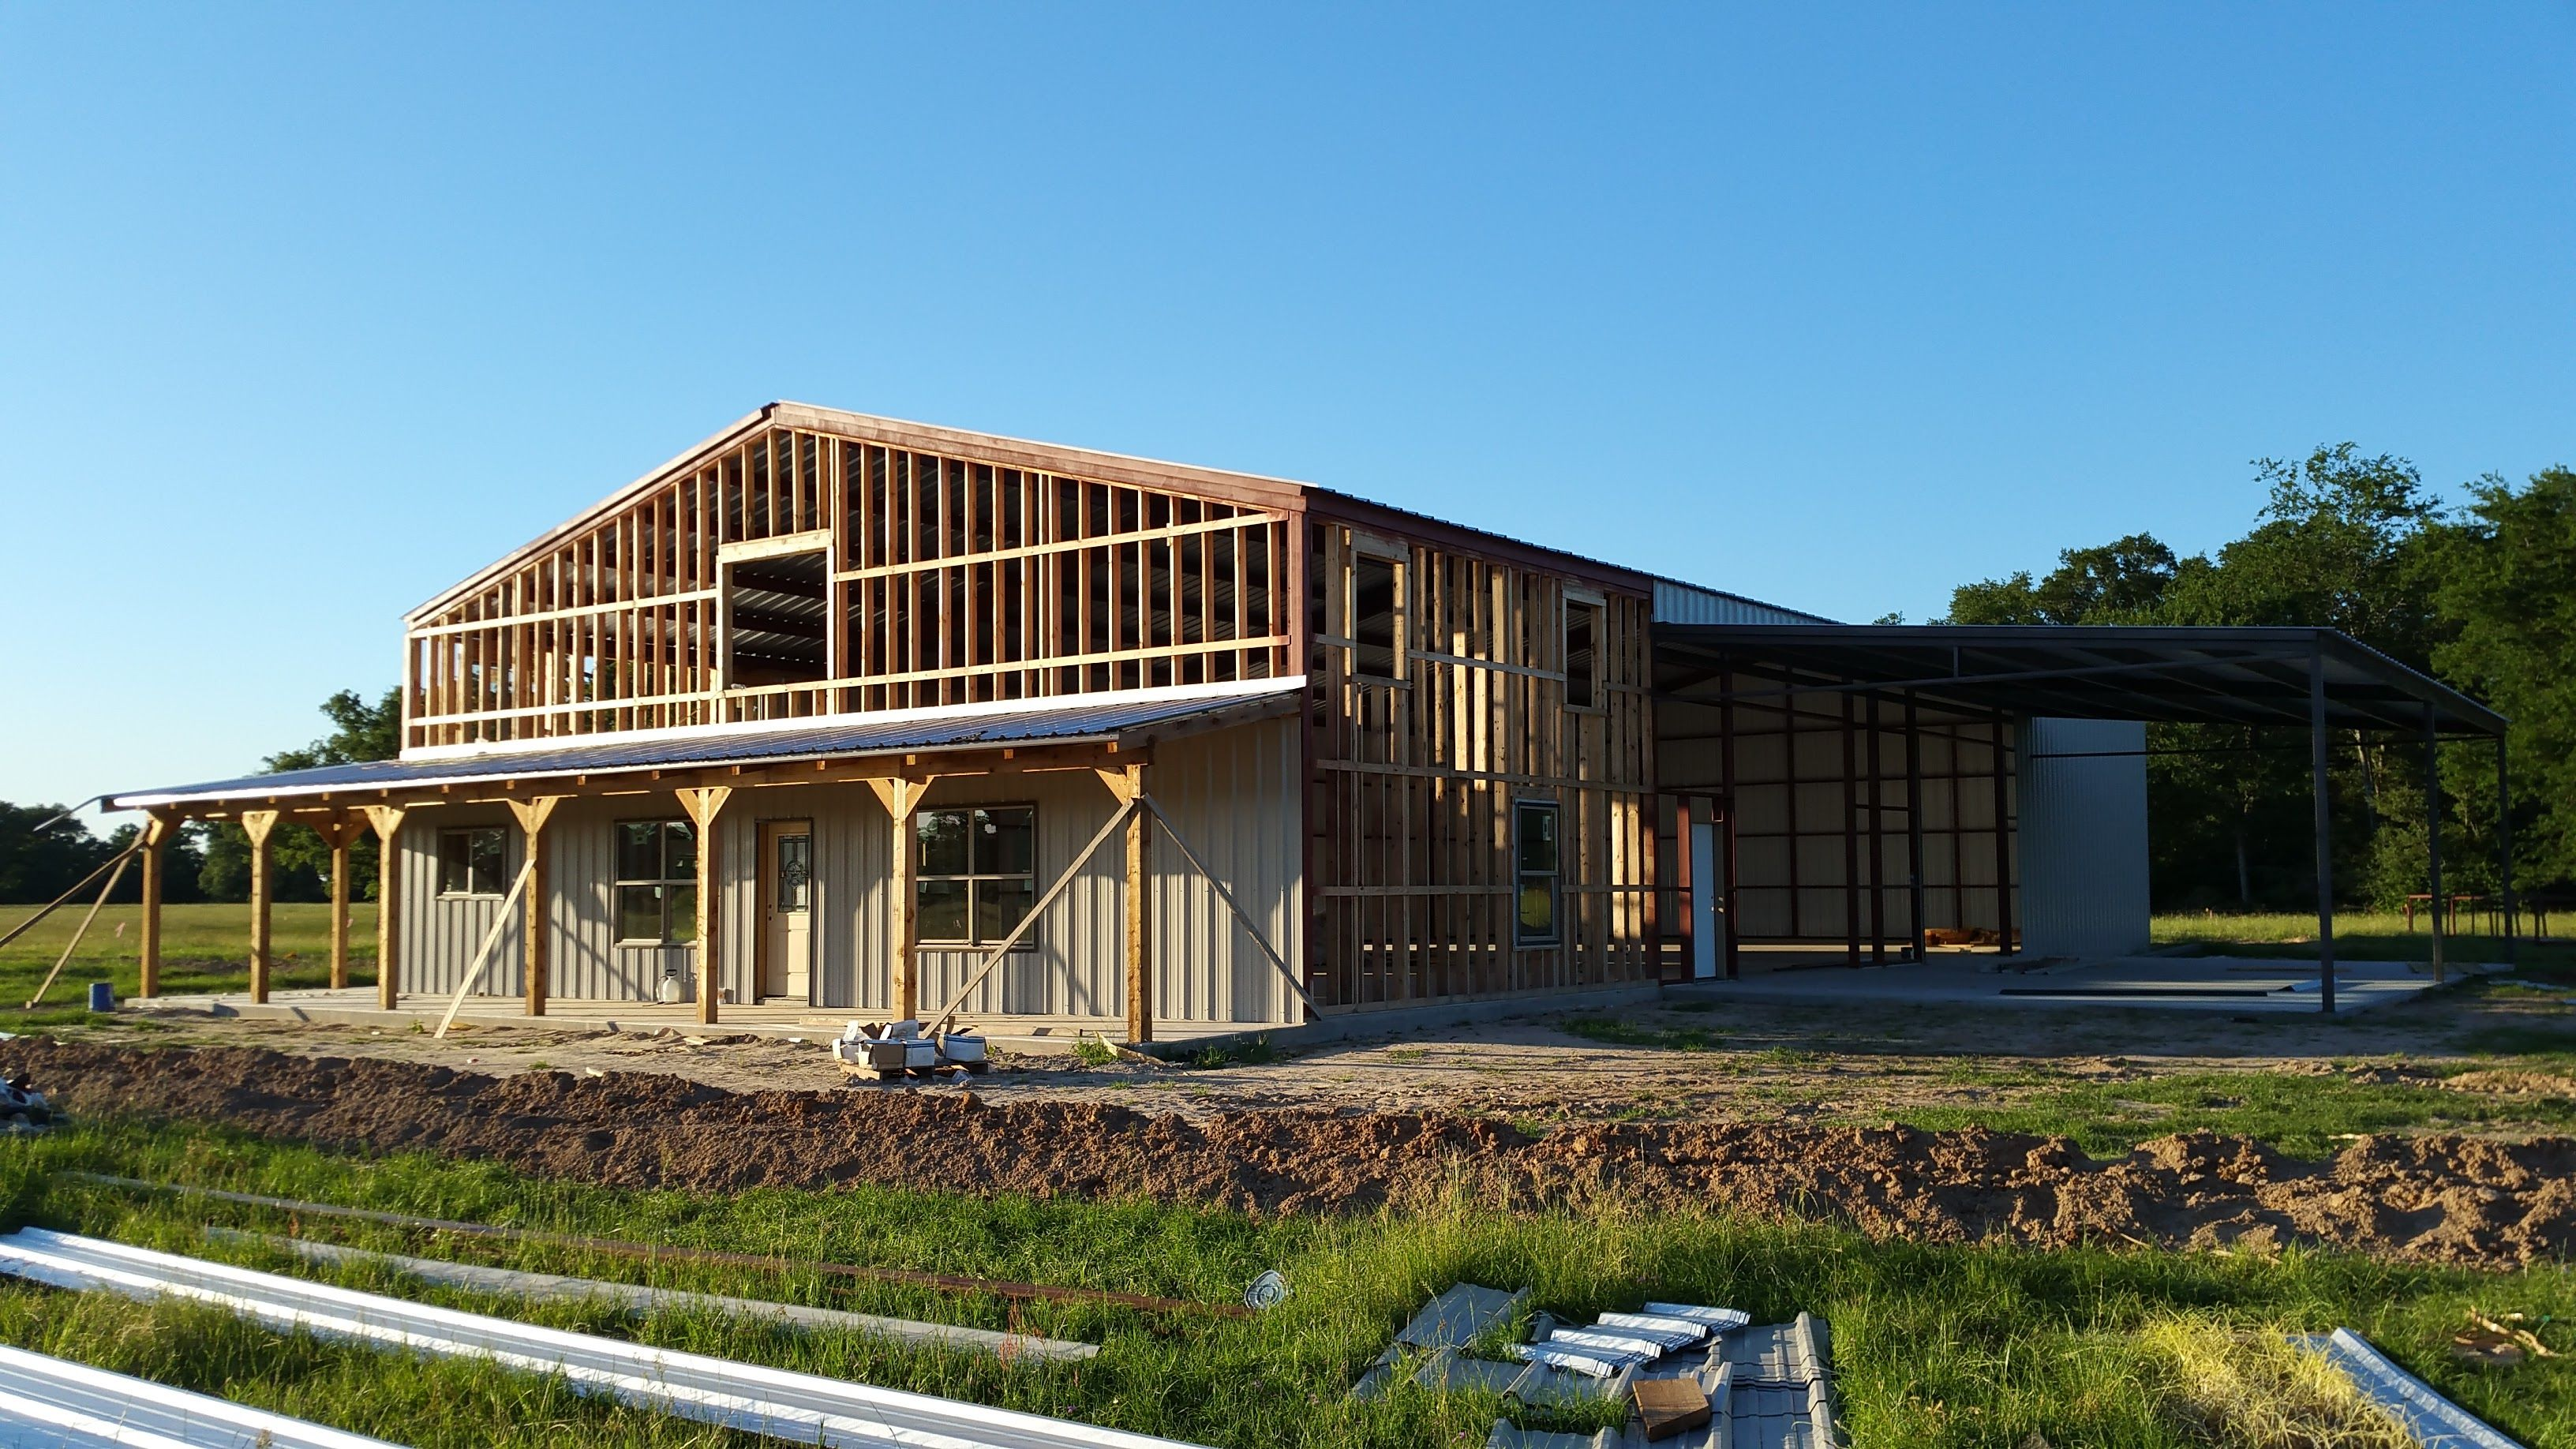 Barndo build barndominium cost barndominium